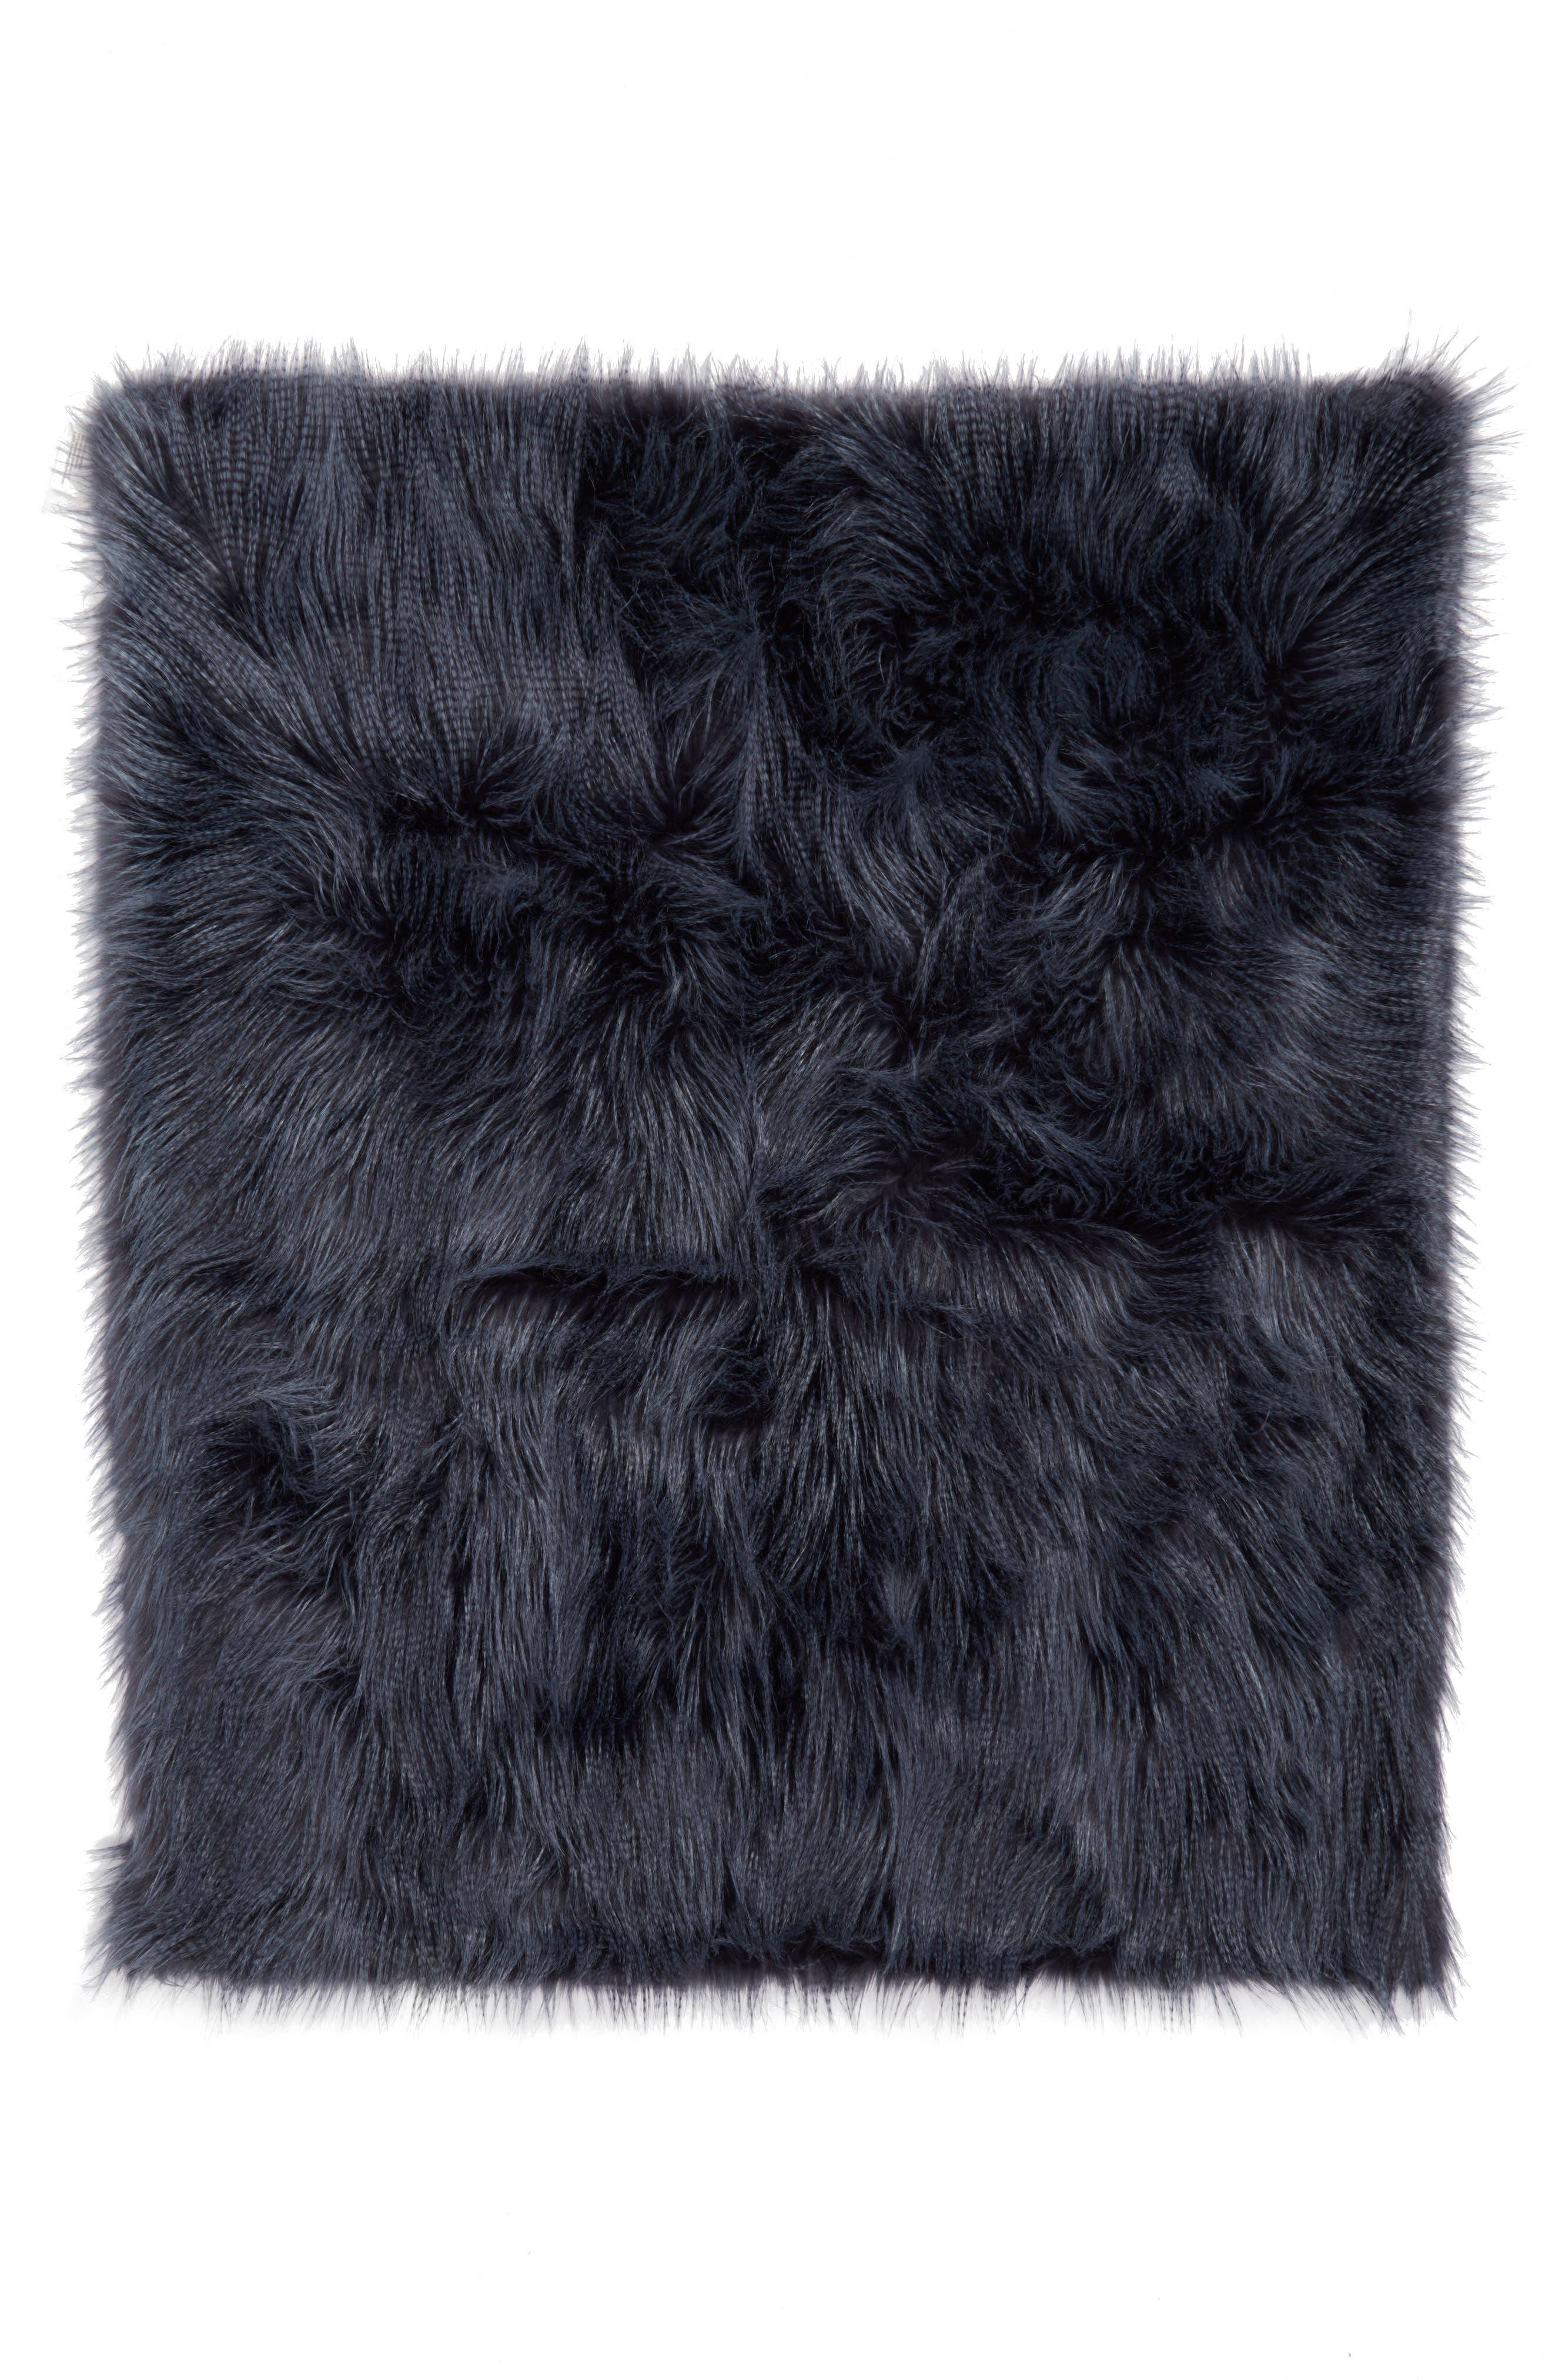 Fauna Faux Fur Throw Blanket,                             Main thumbnail 1, color,                             Navy Armada